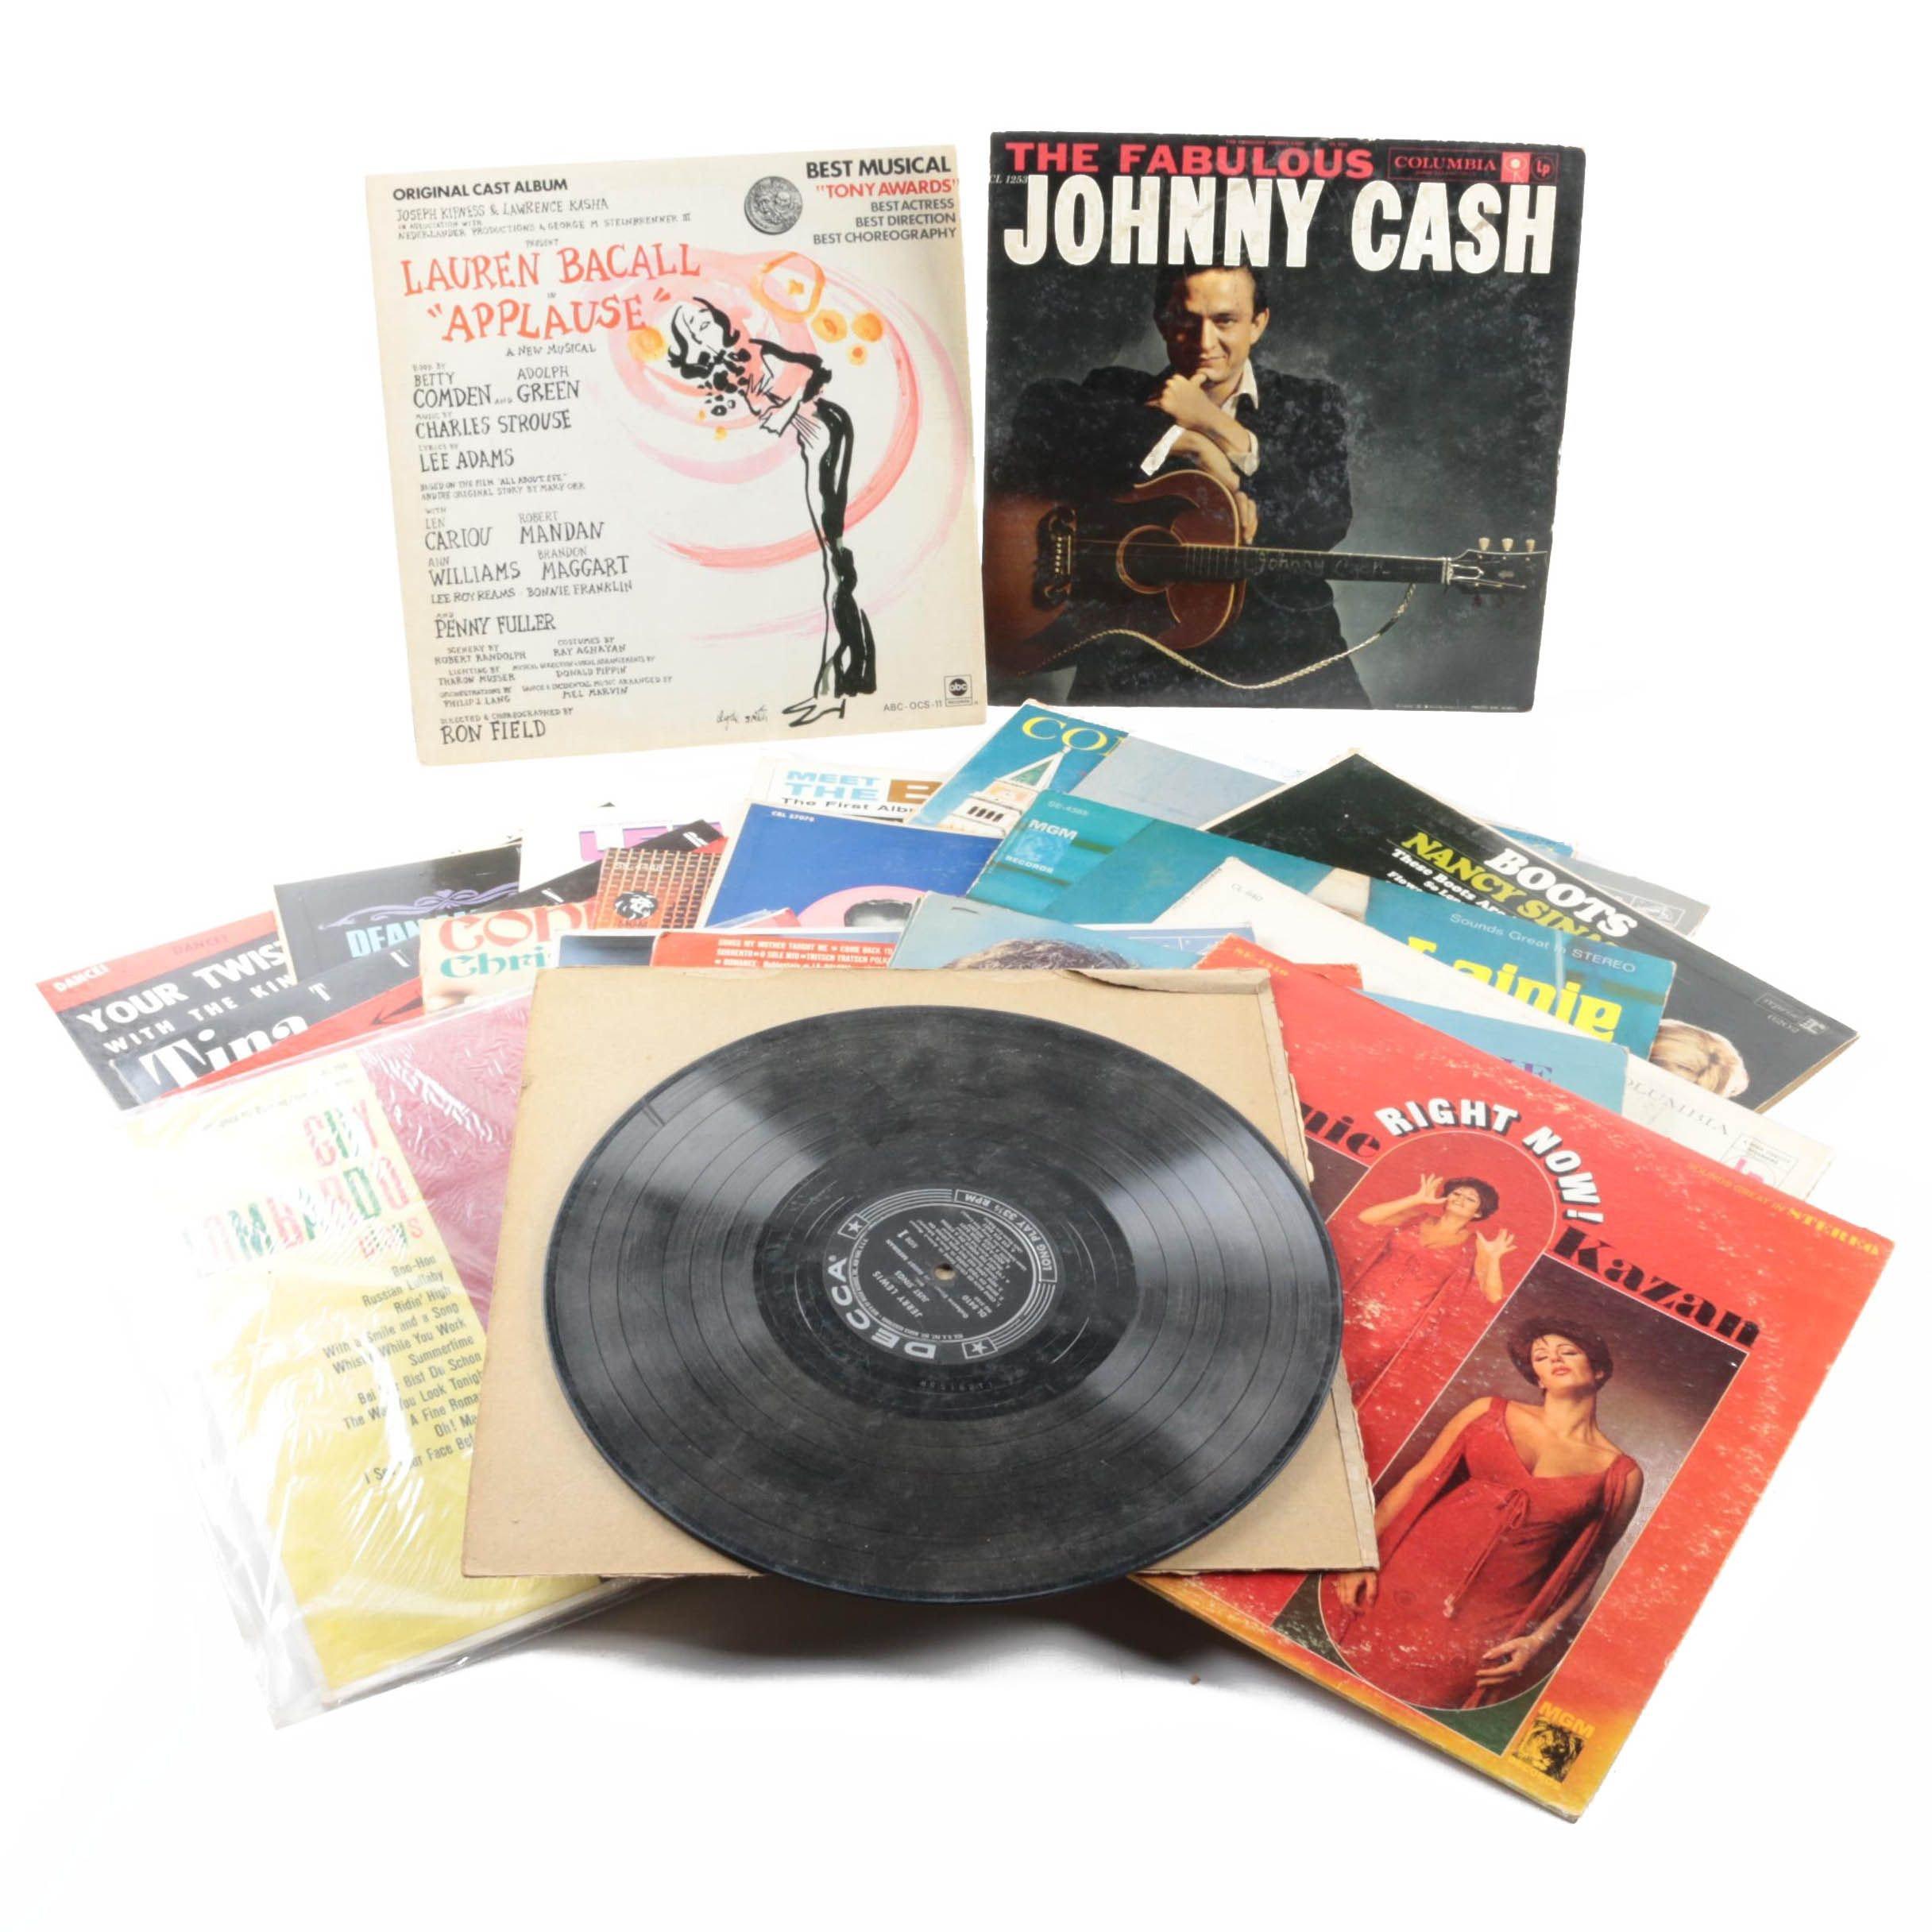 Beatles, Johnny Cash, Nancy Sinatra and Other Pop, Jazz and Soundtrack Records